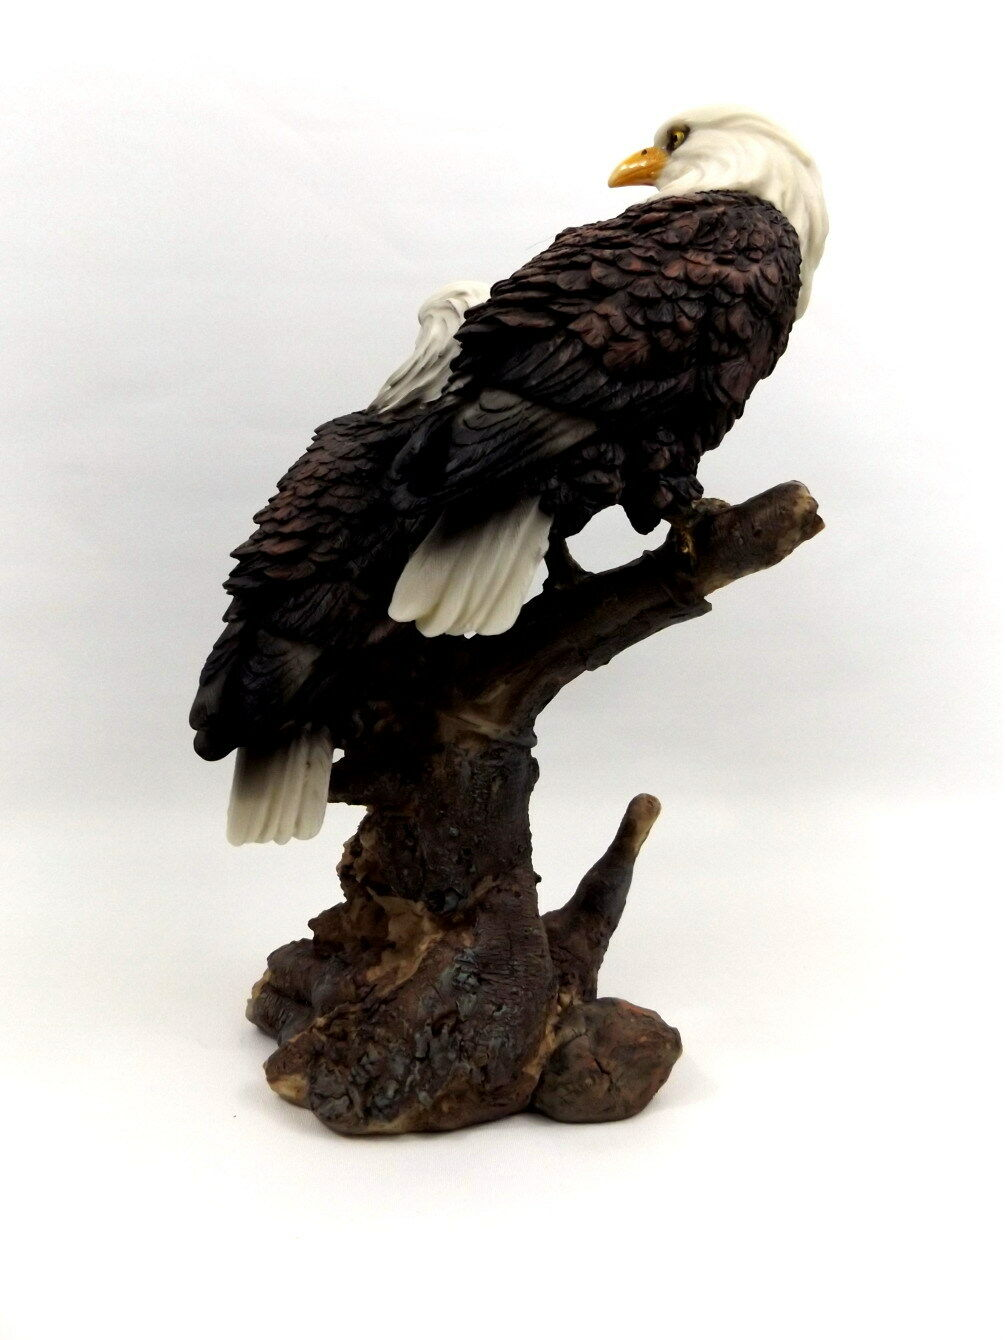 Wei kopf adler vogel eagle seeadler deko garten tier figur for Deko vogel garten